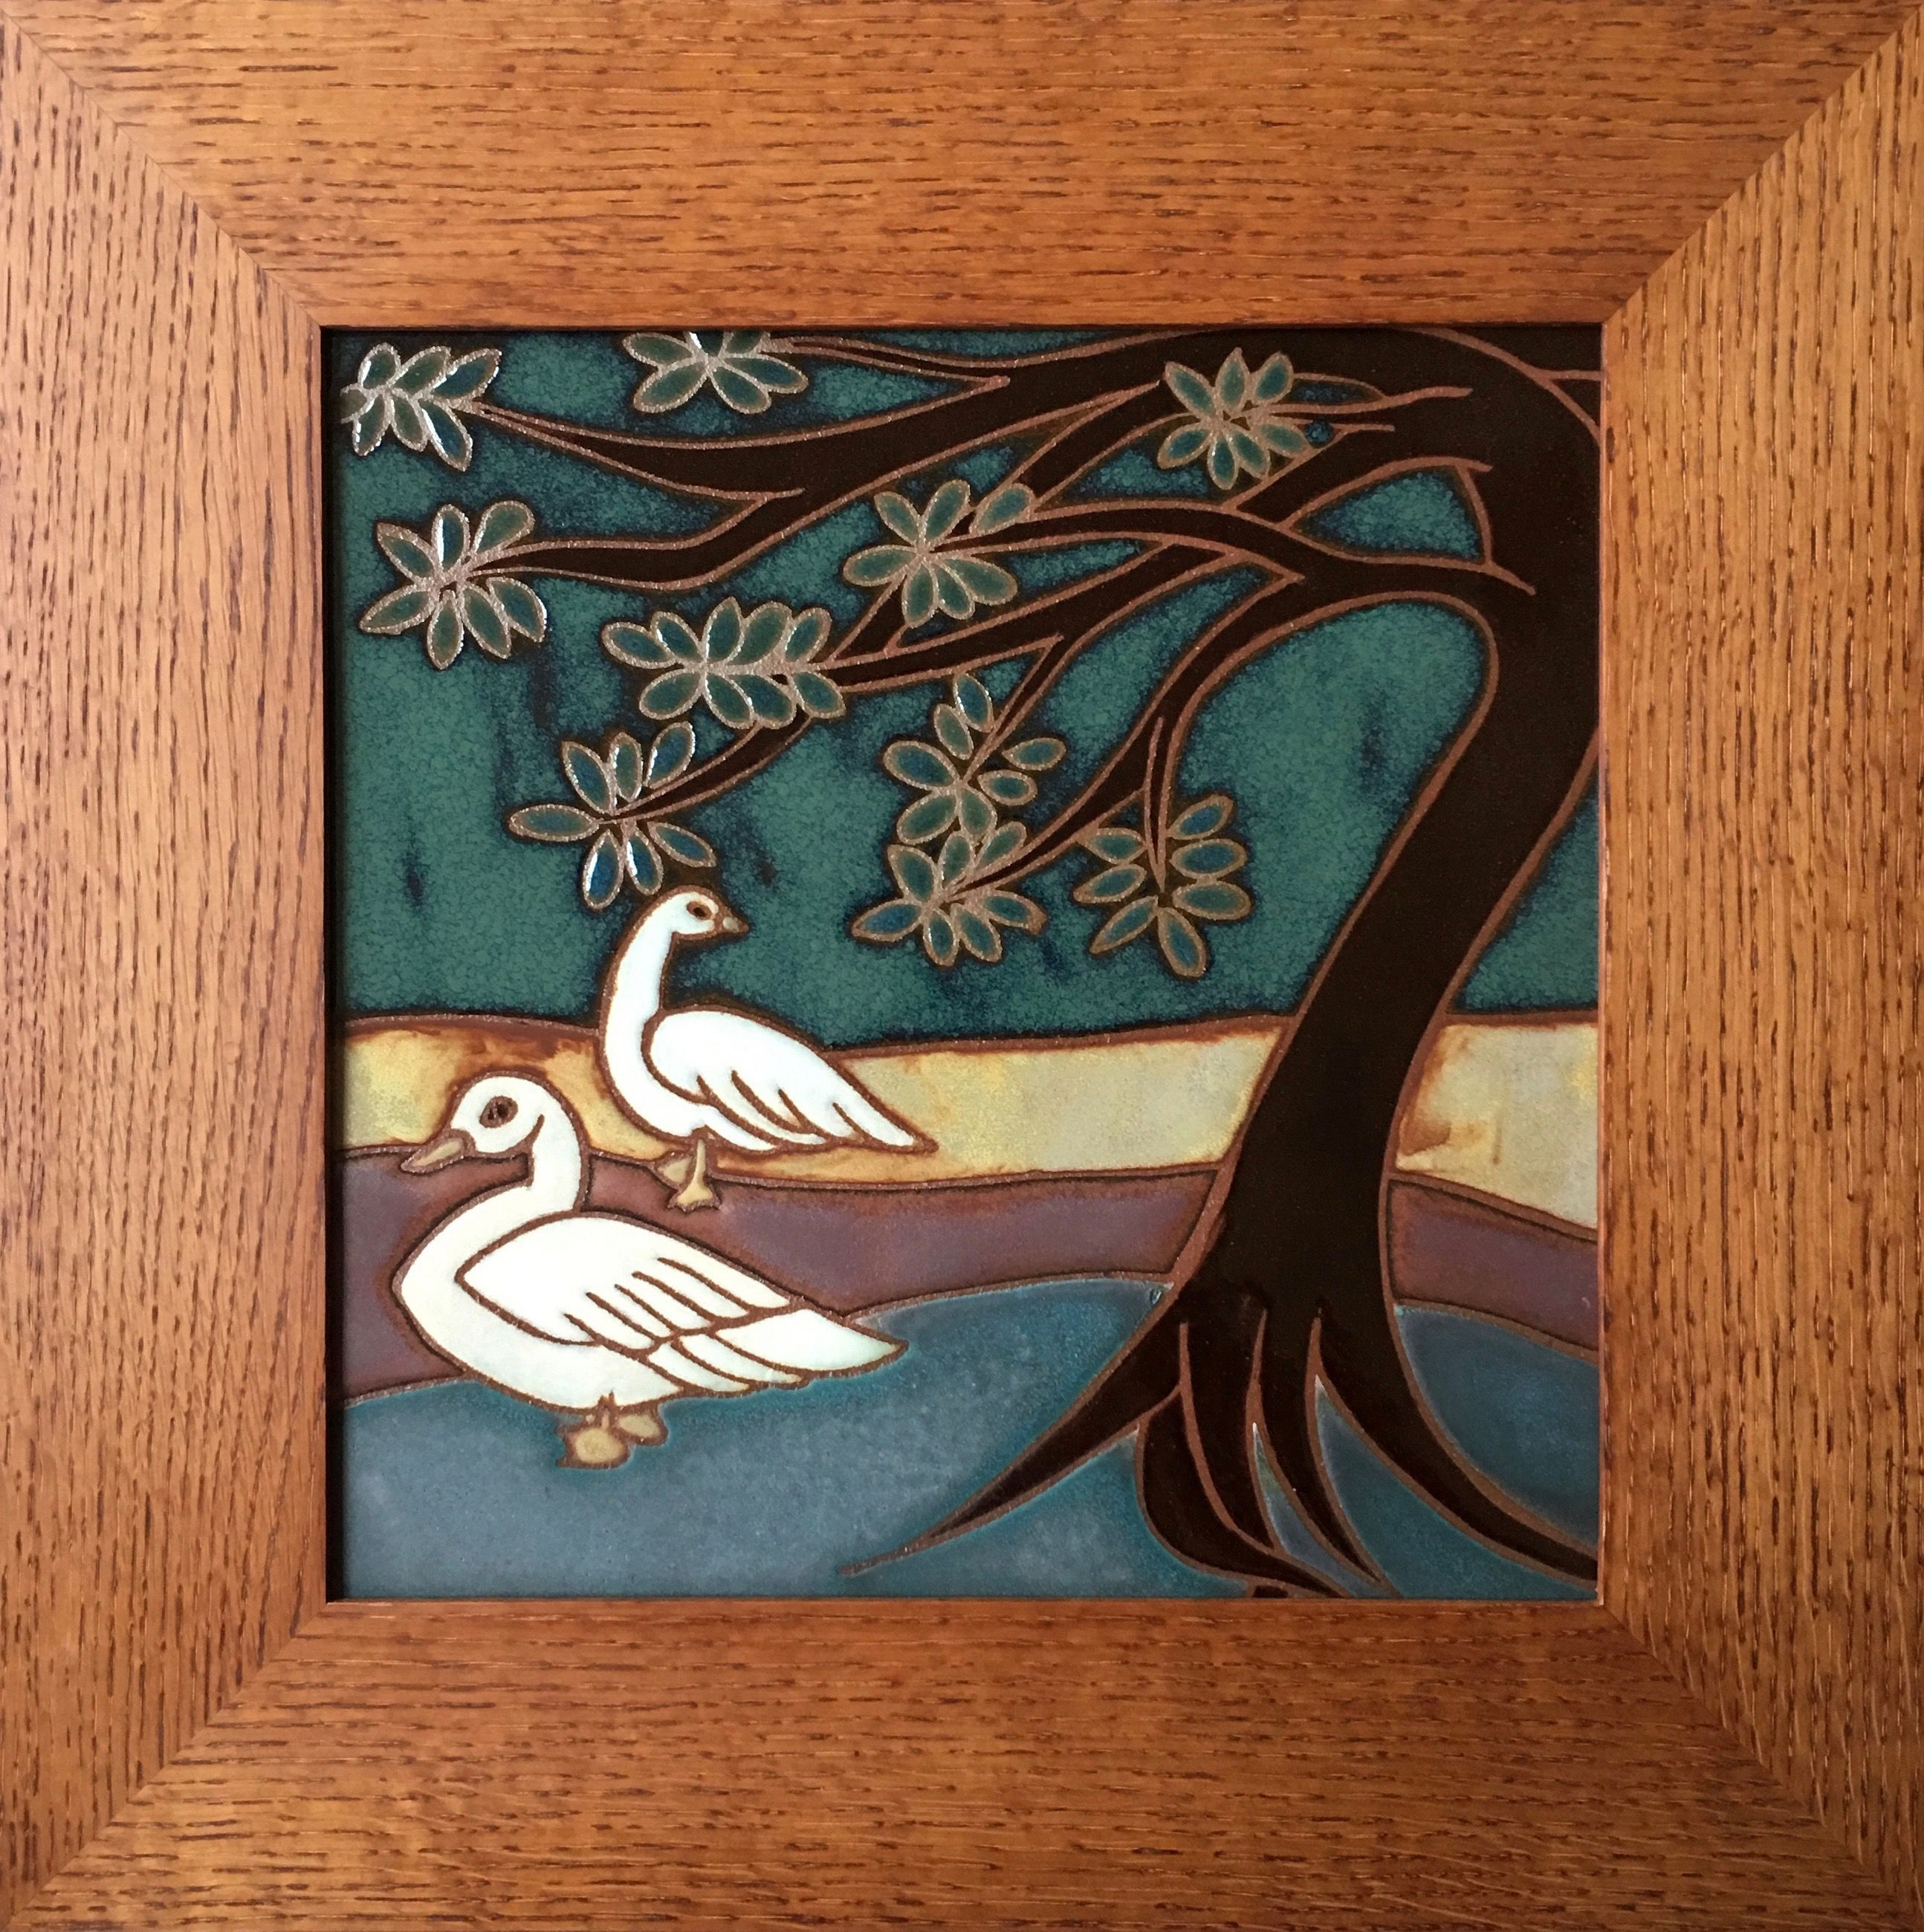 Handmade Ceramic Tile By Artist Marina Bosetti Of A Goose